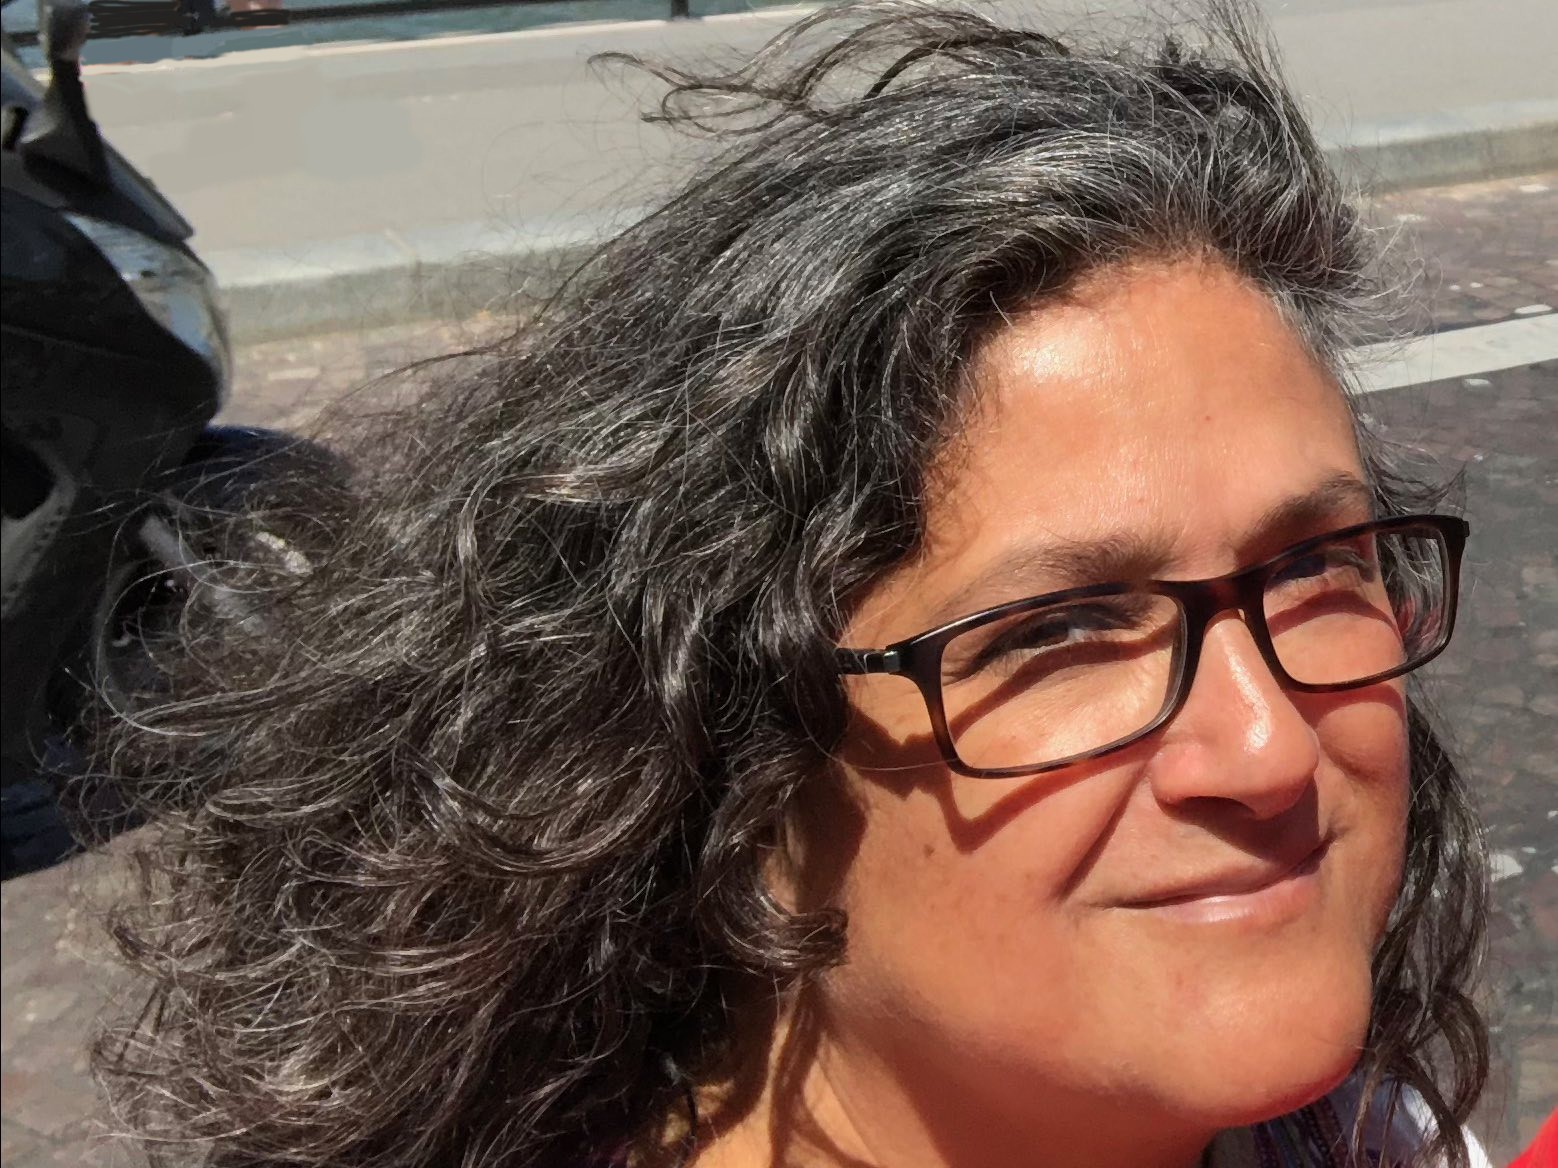 Elsa Gonzalez Palacios